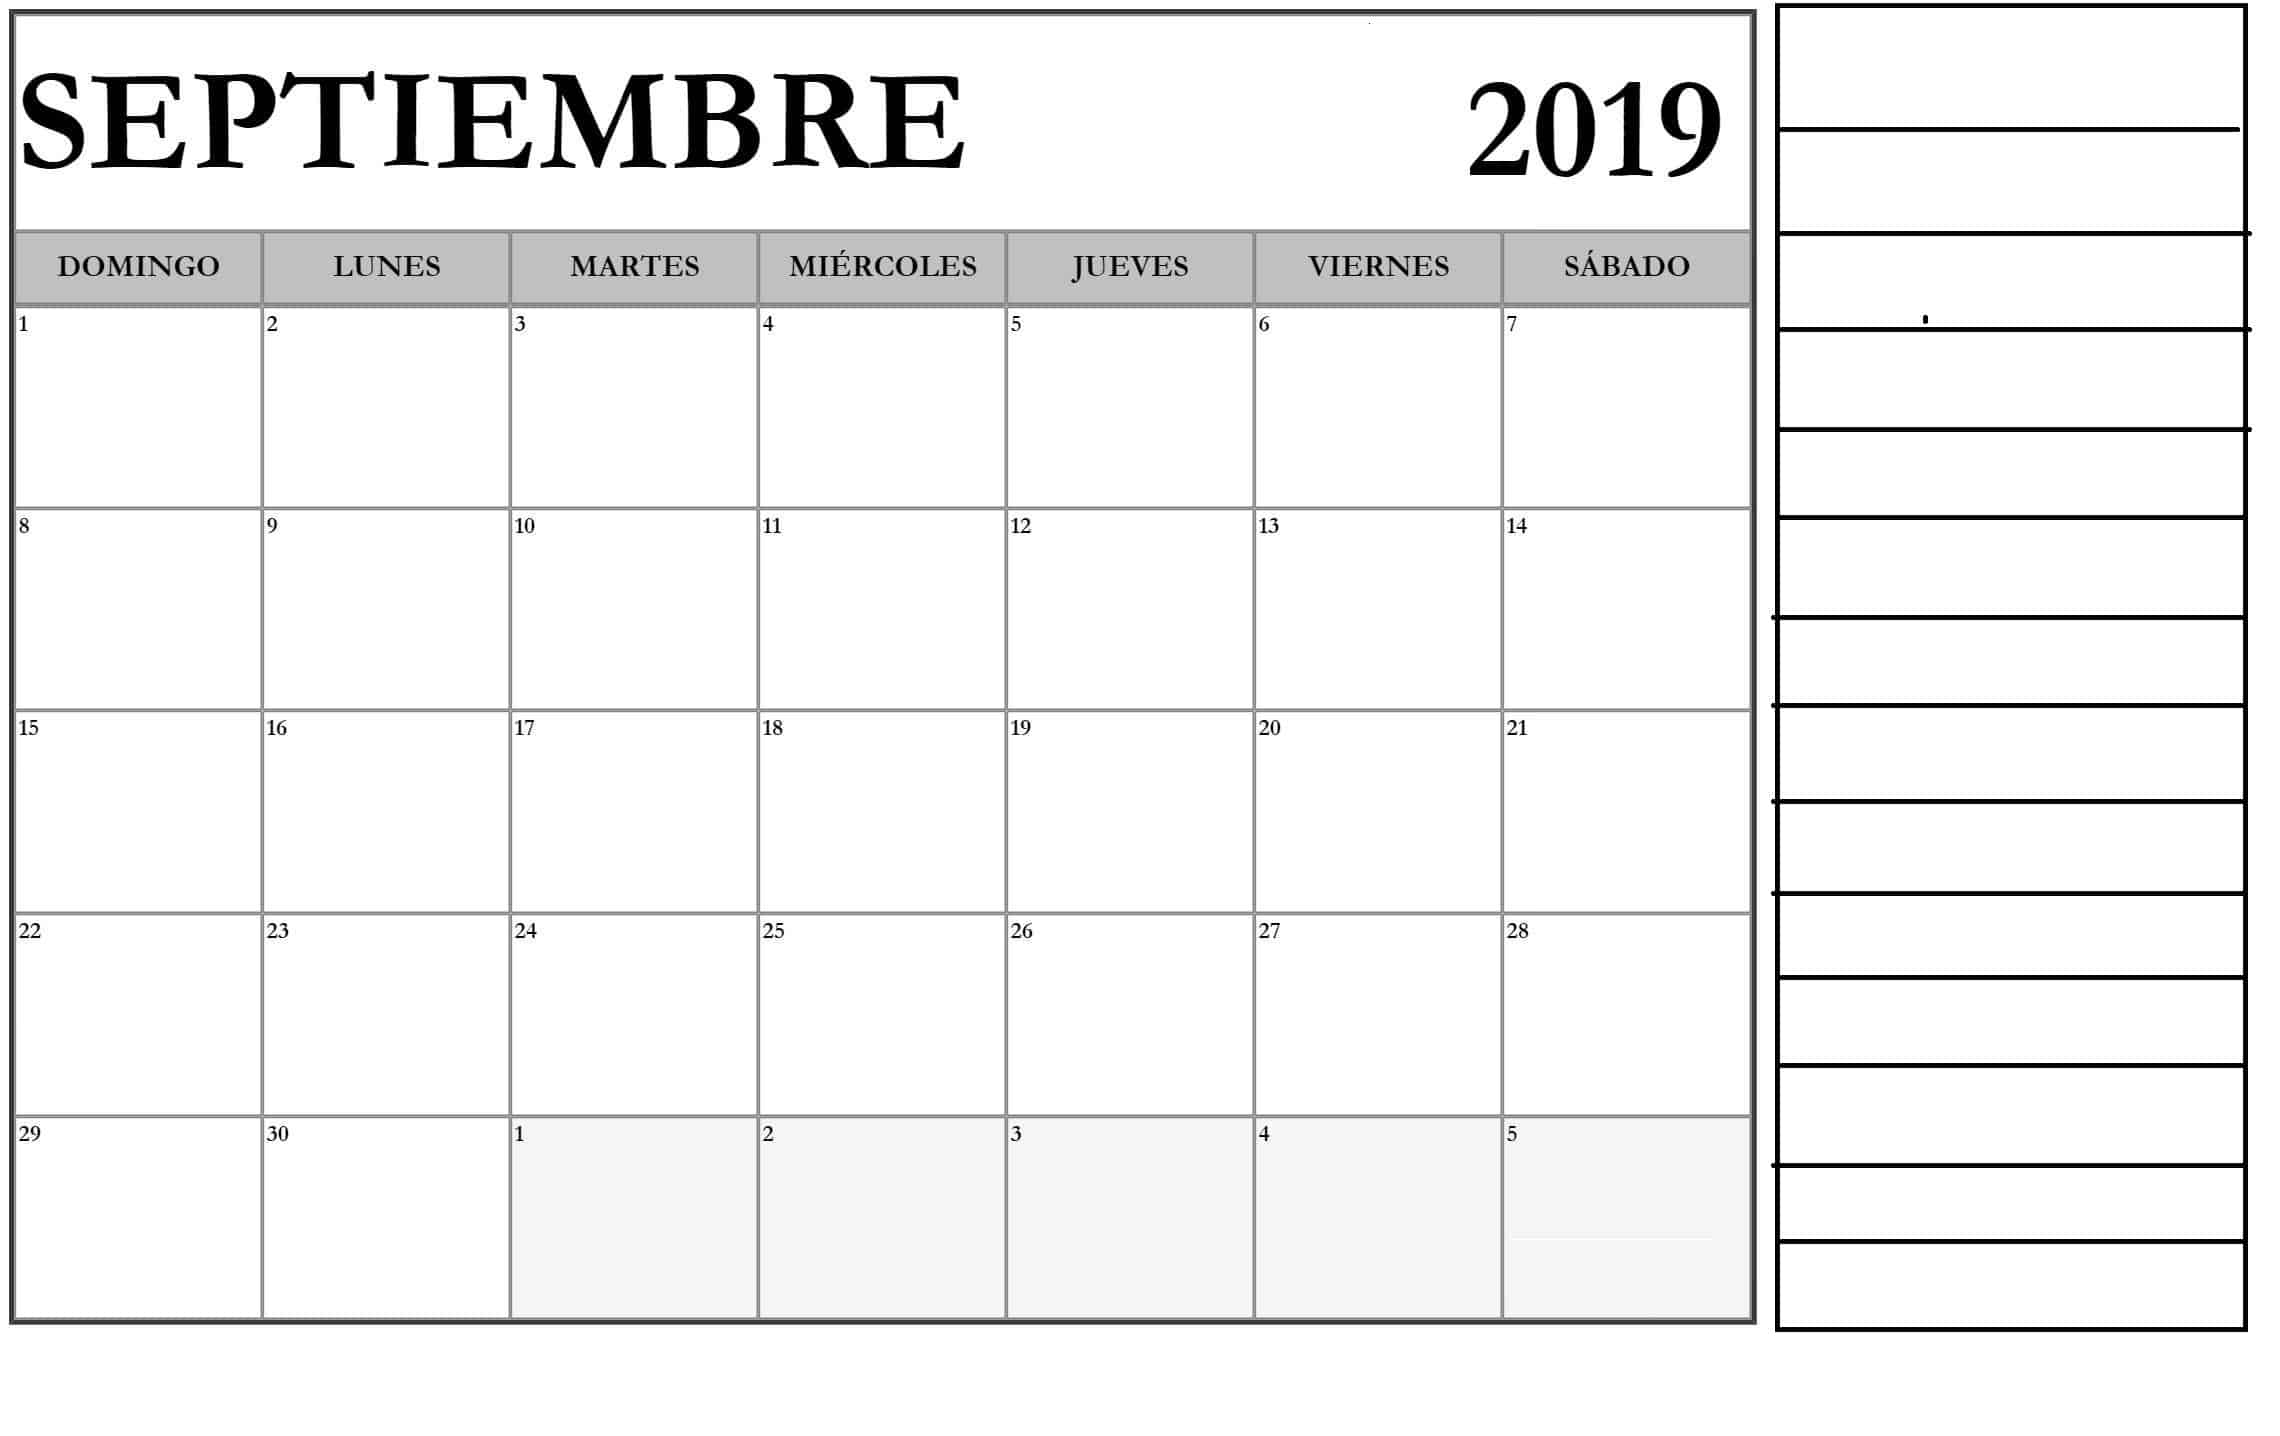 Septiembre 2019 Calendario Gratis Para Imprimir